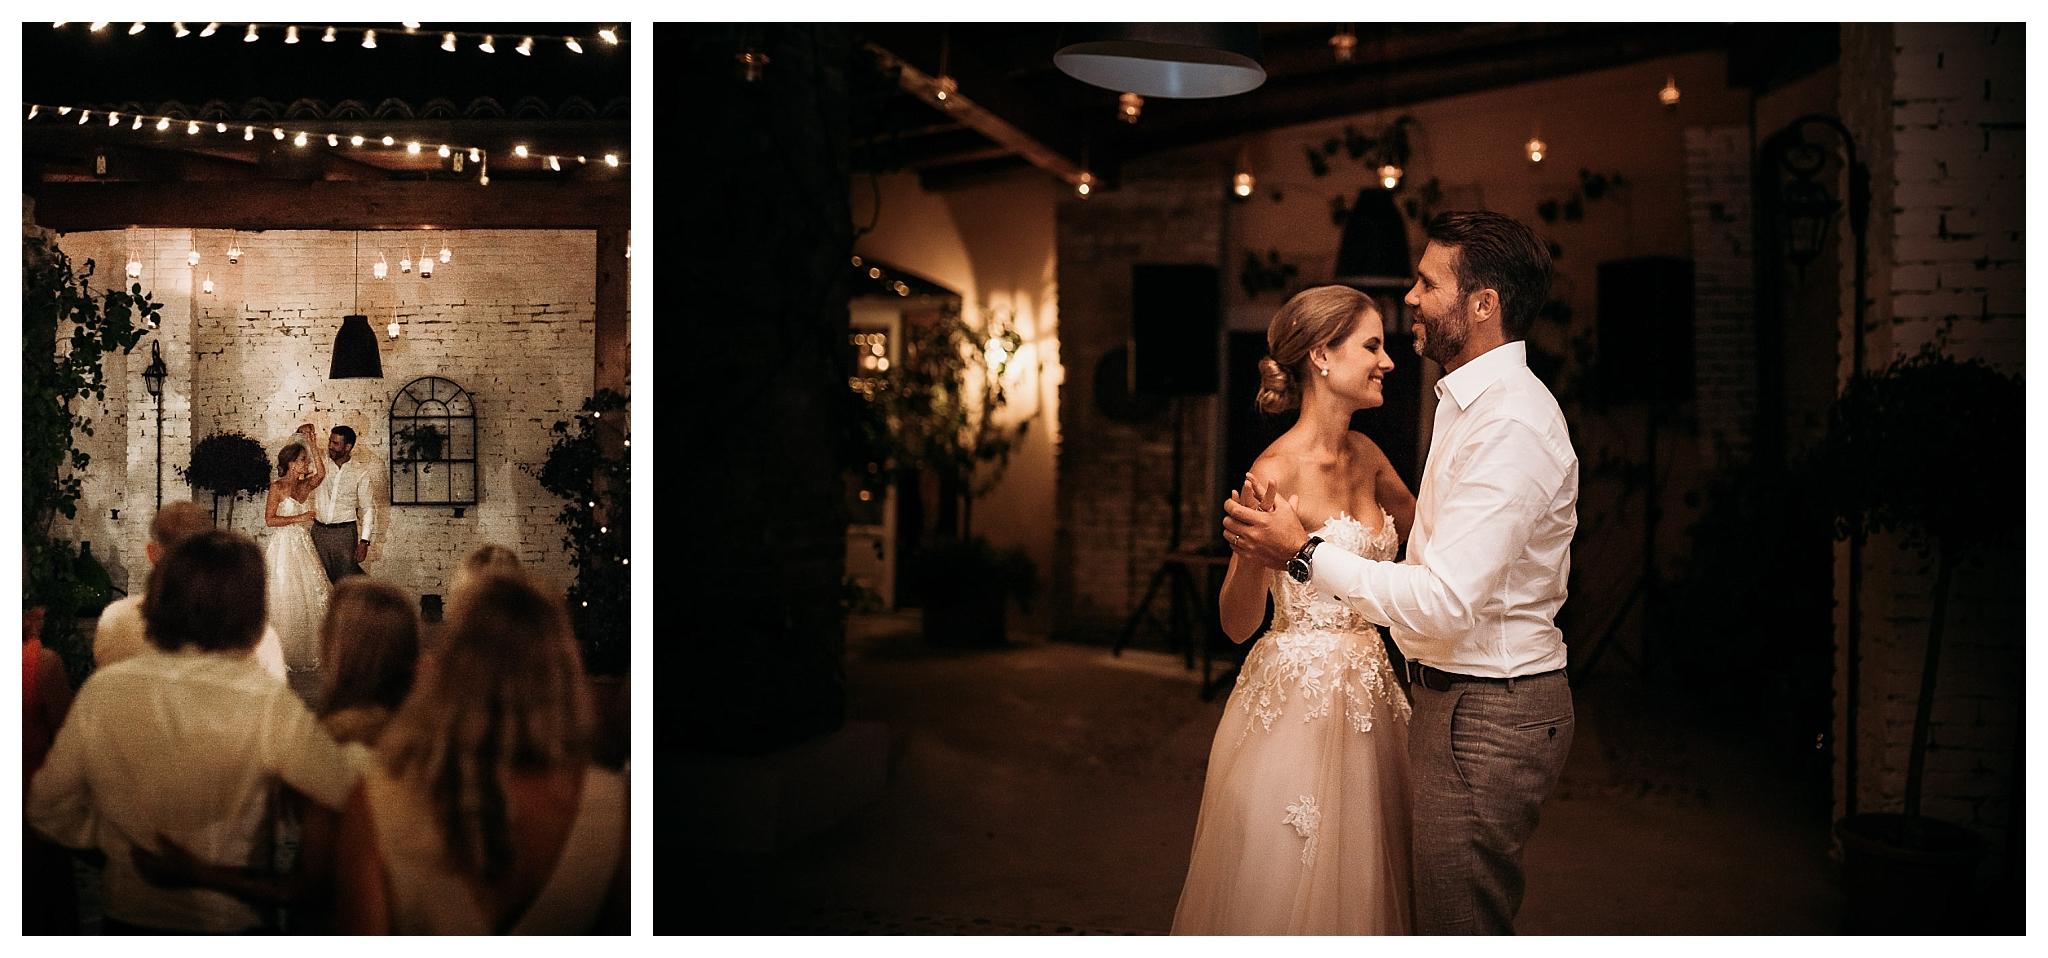 First dance at La Villa Hotel weddings